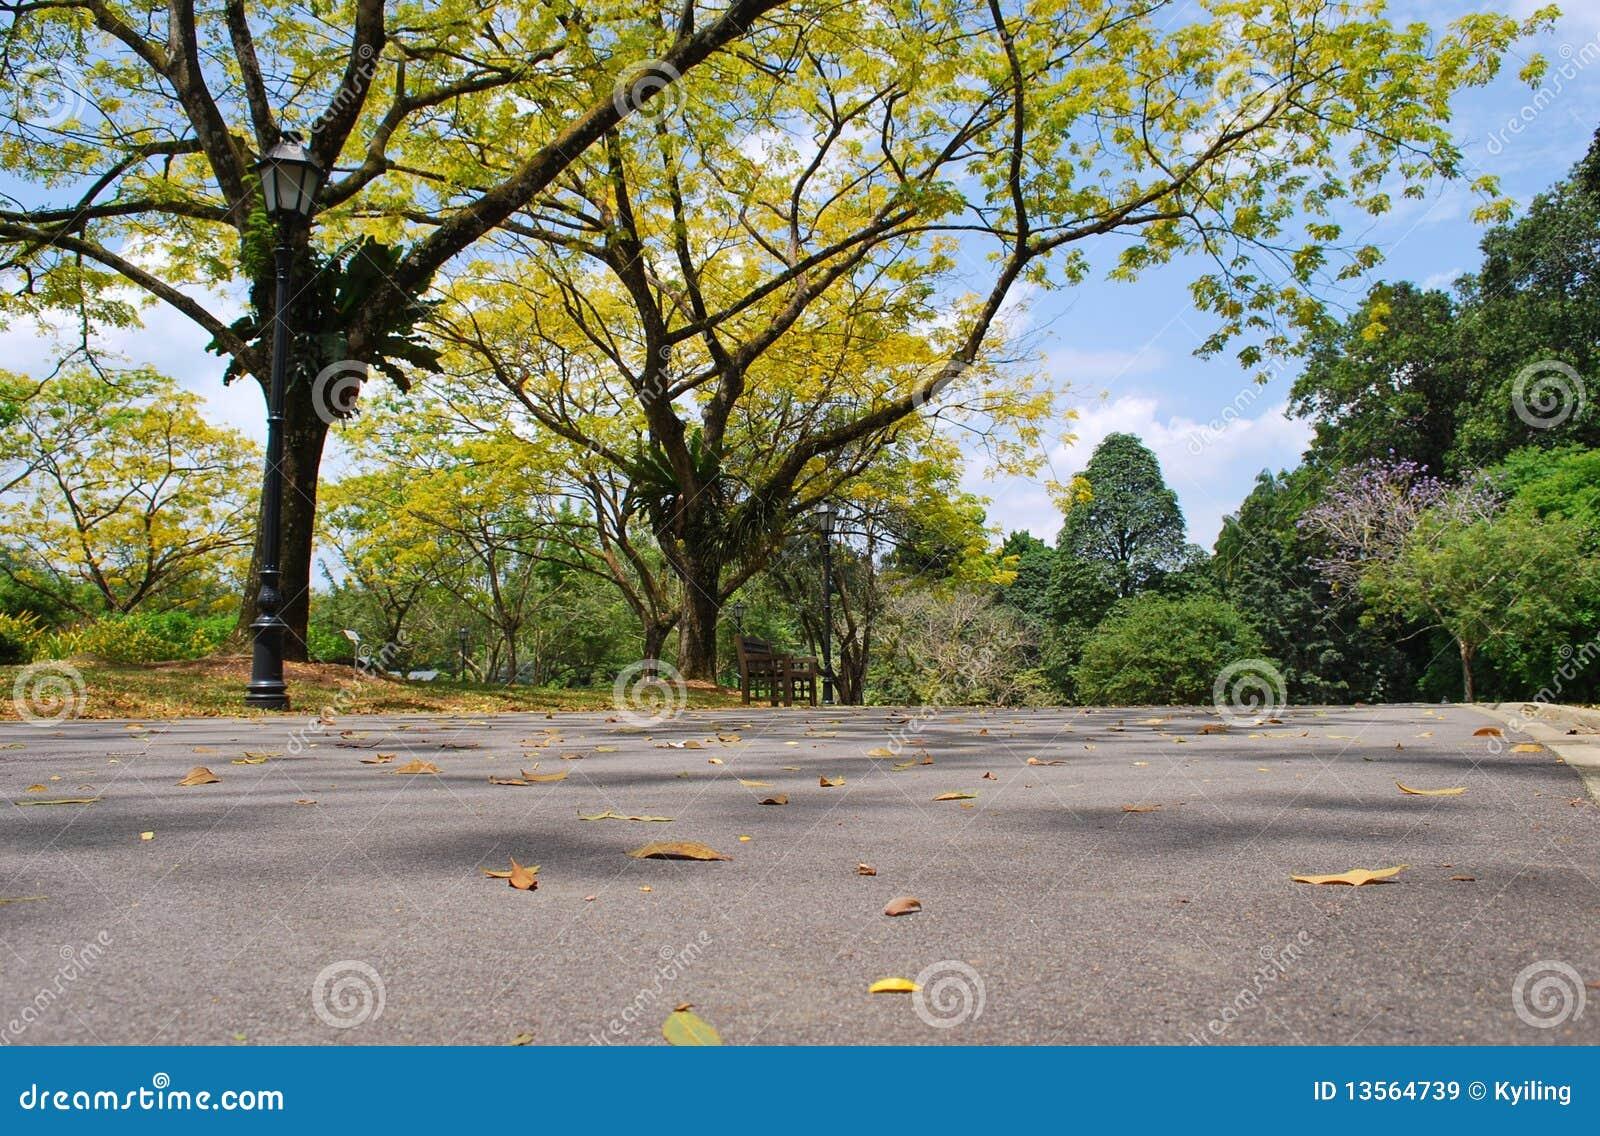 Botanical Gardens Royalty Free Stock Images Image 13564739